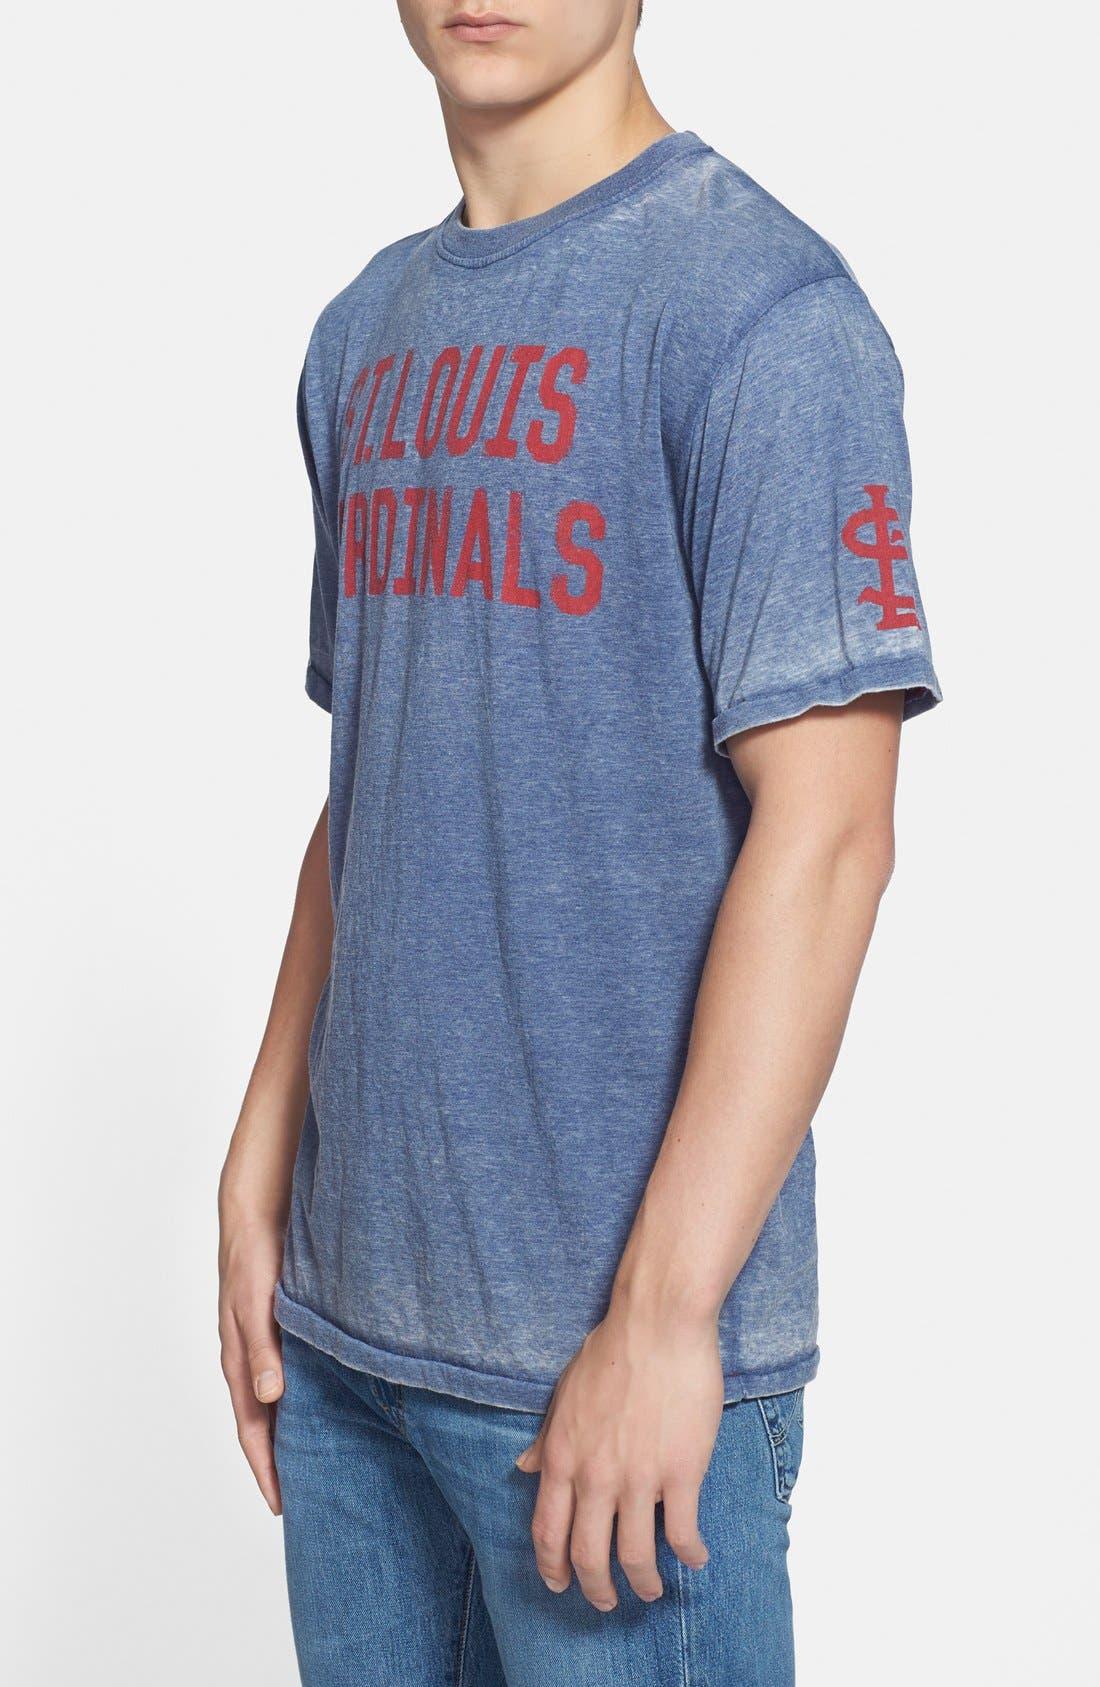 Red Jacket 'St. Louis Cardinals - Hoist' Graphic T-Shirt